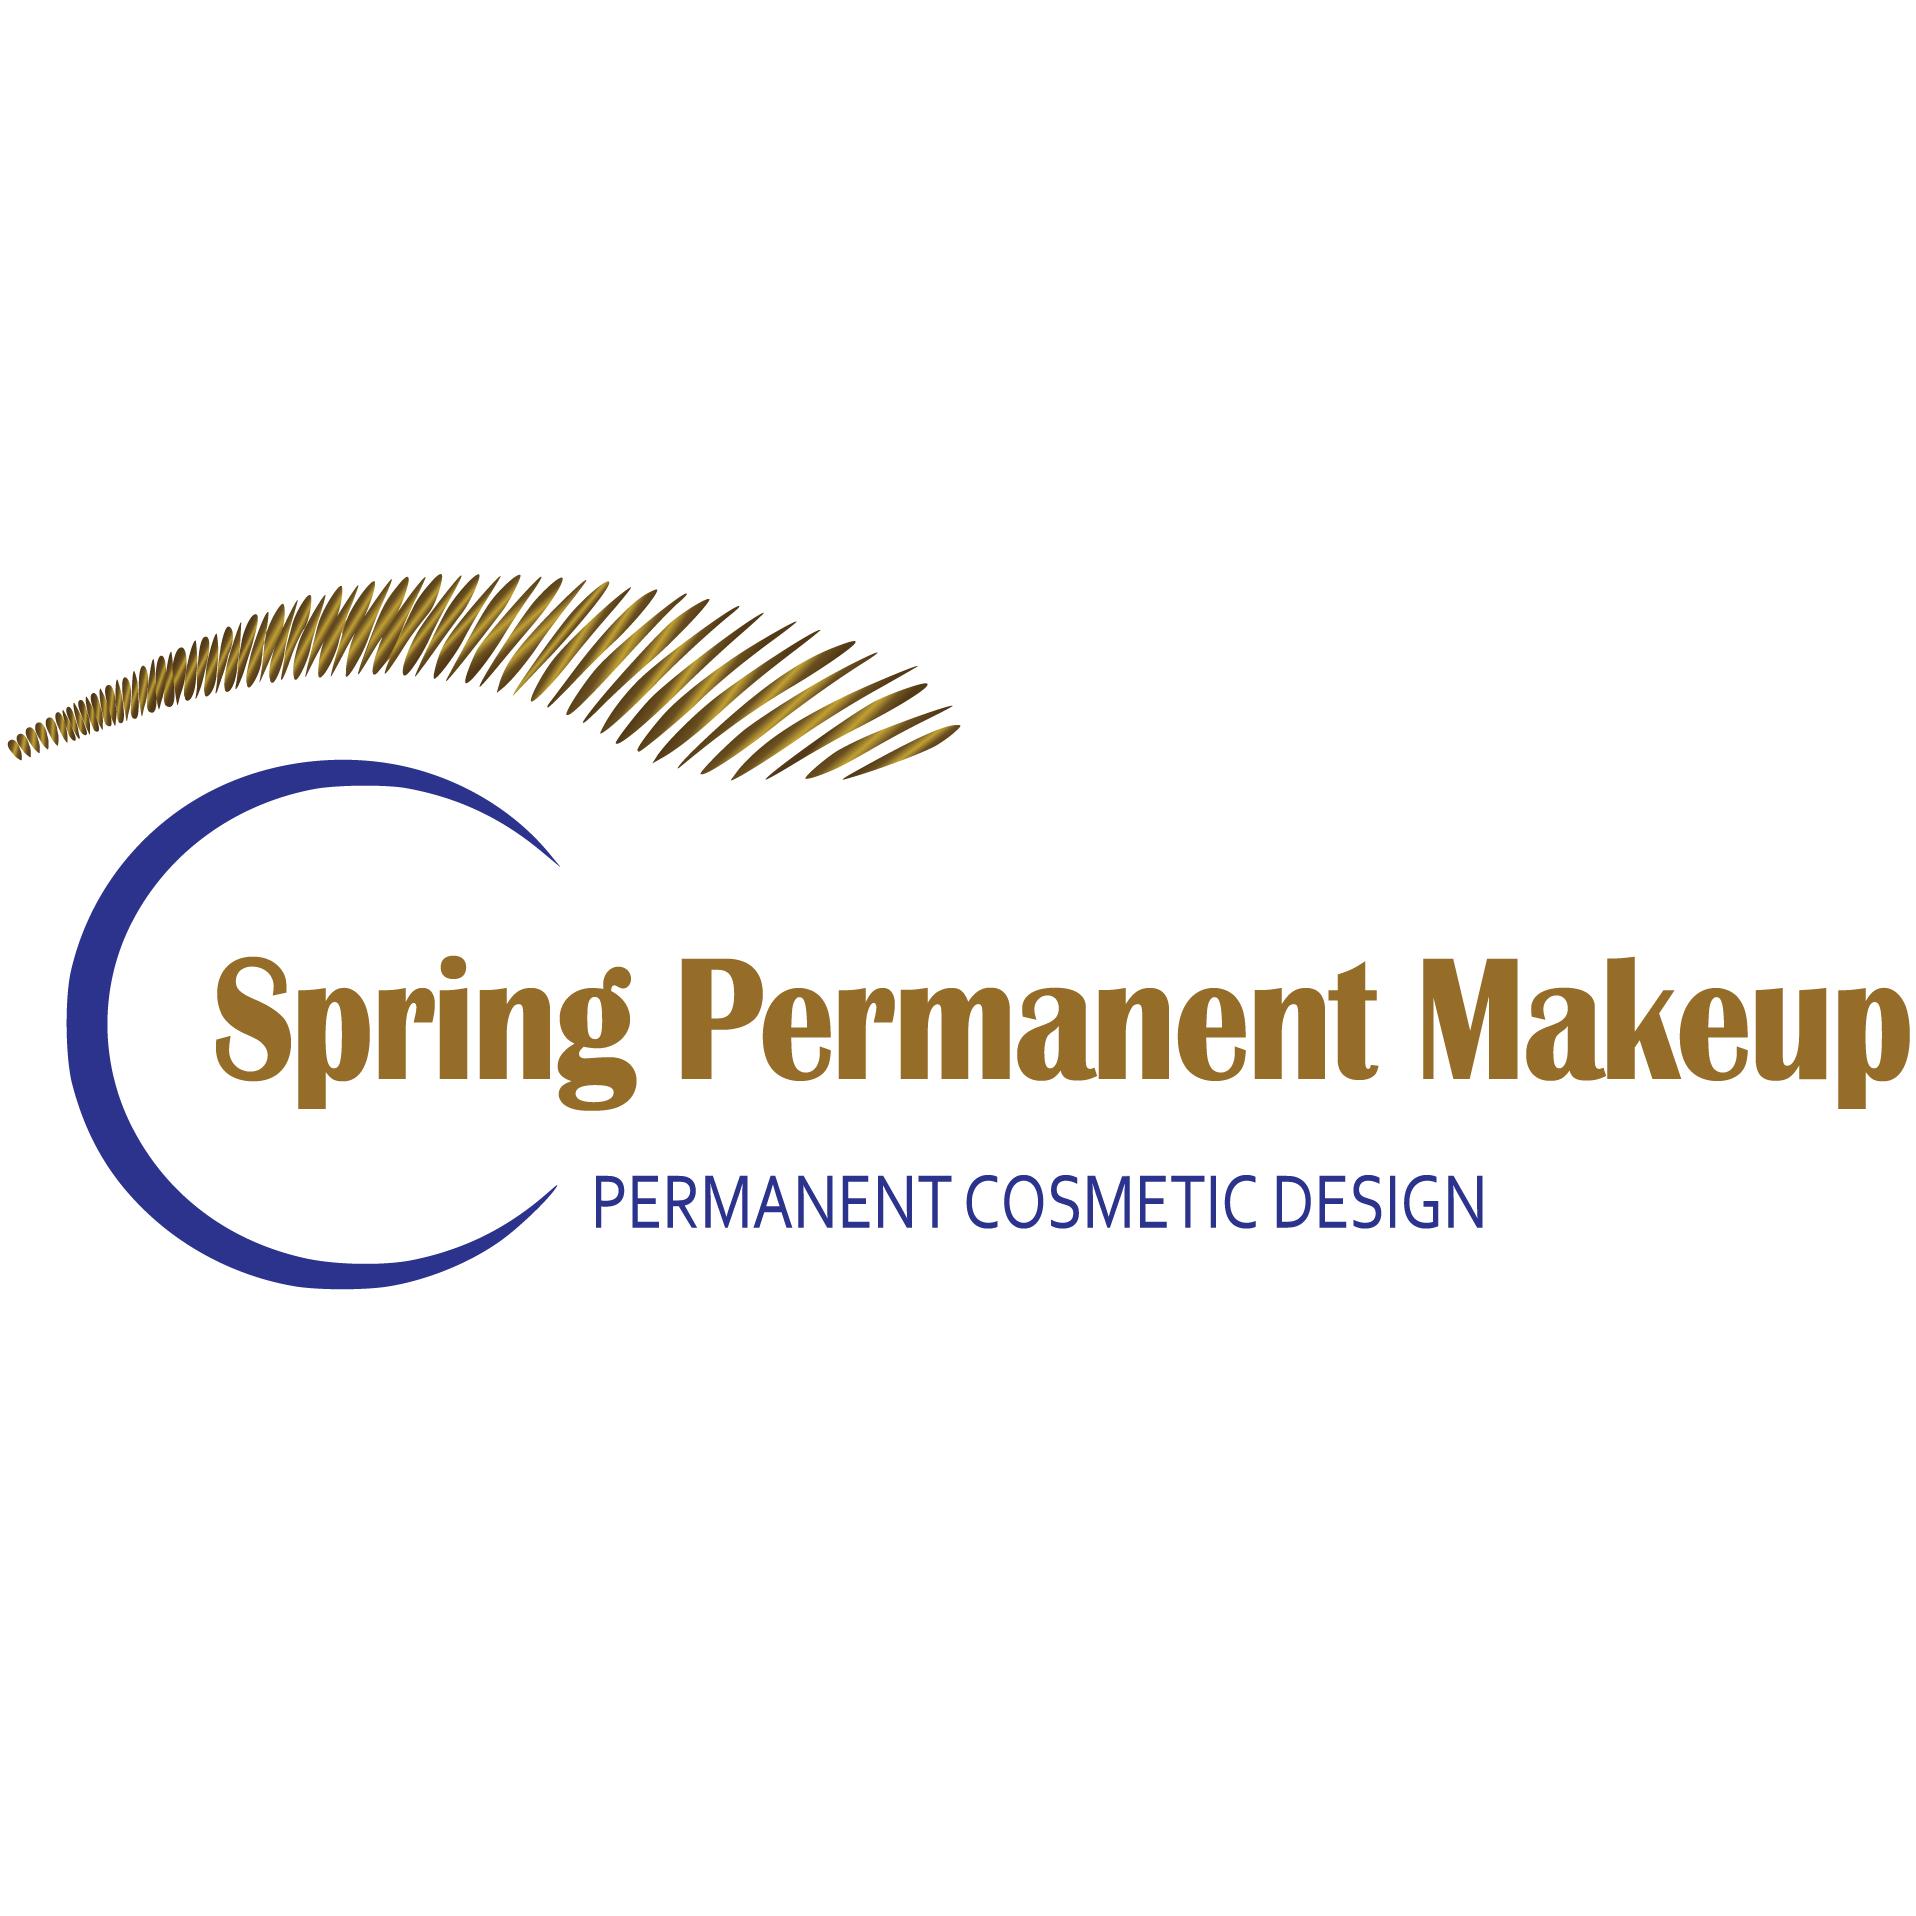 Spring Permanent Makeup